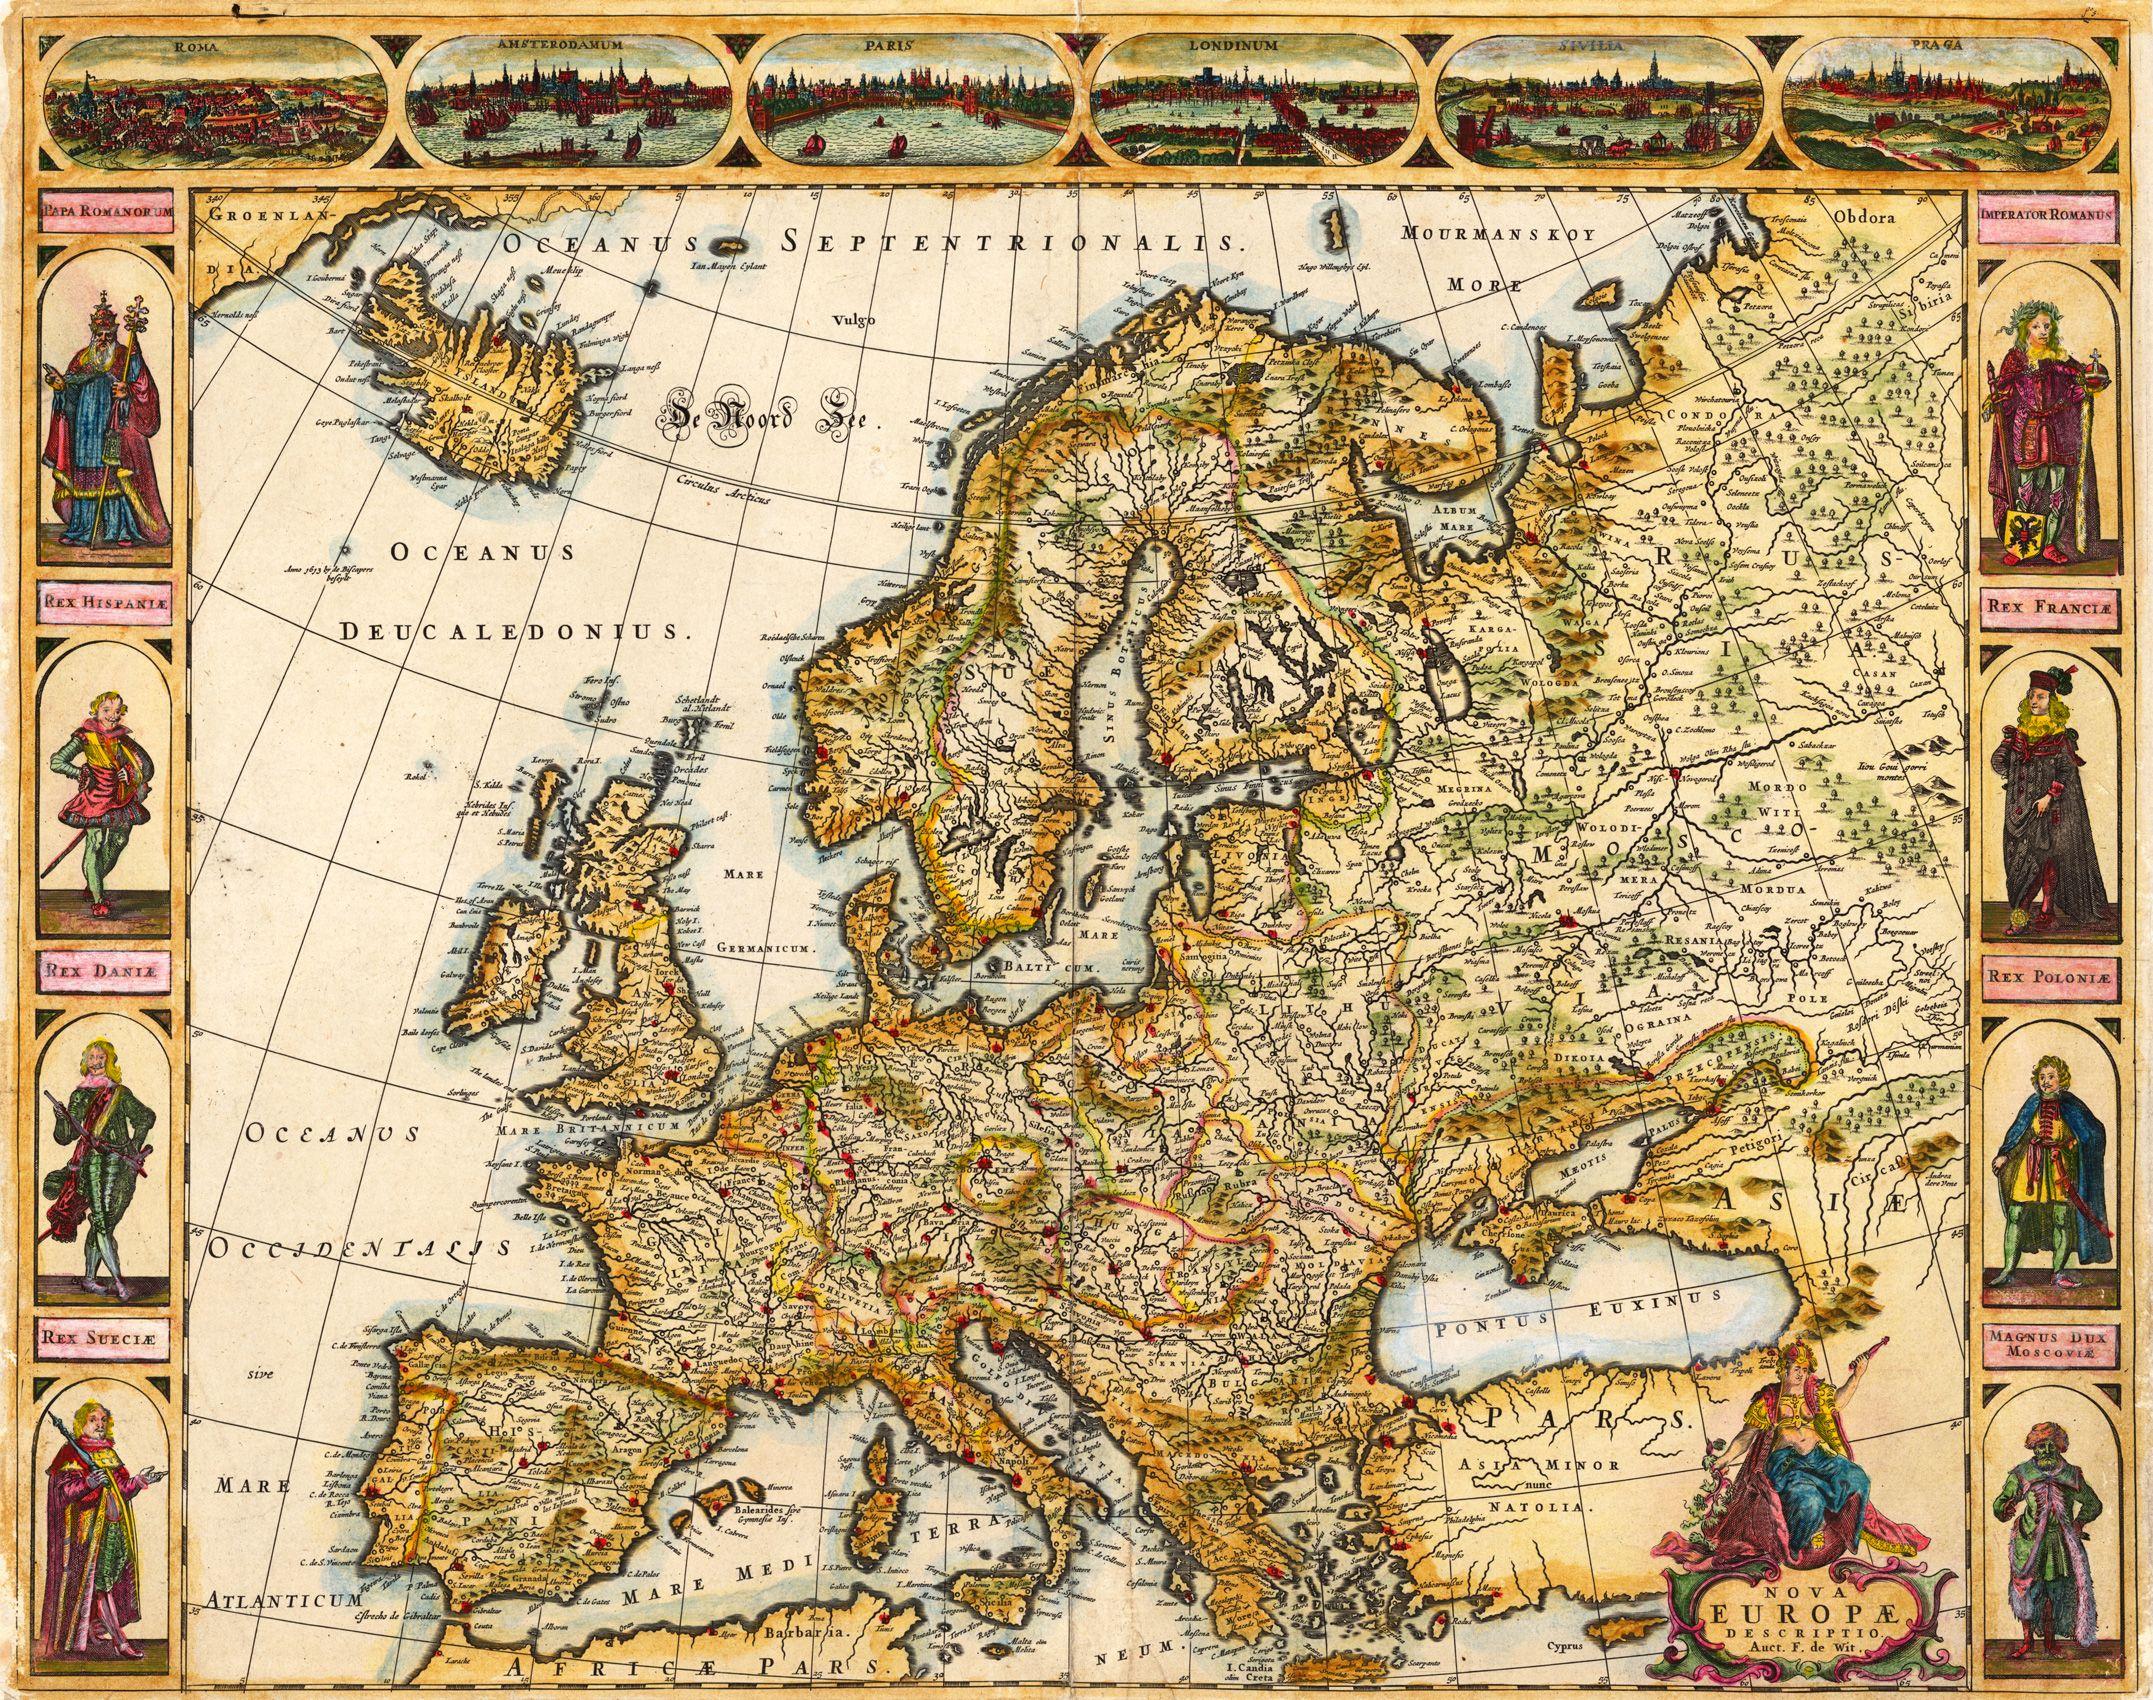 Europe De Wit Frederick Nova Europae Descriptio Auct F De Wit - Amsterdam map in europe